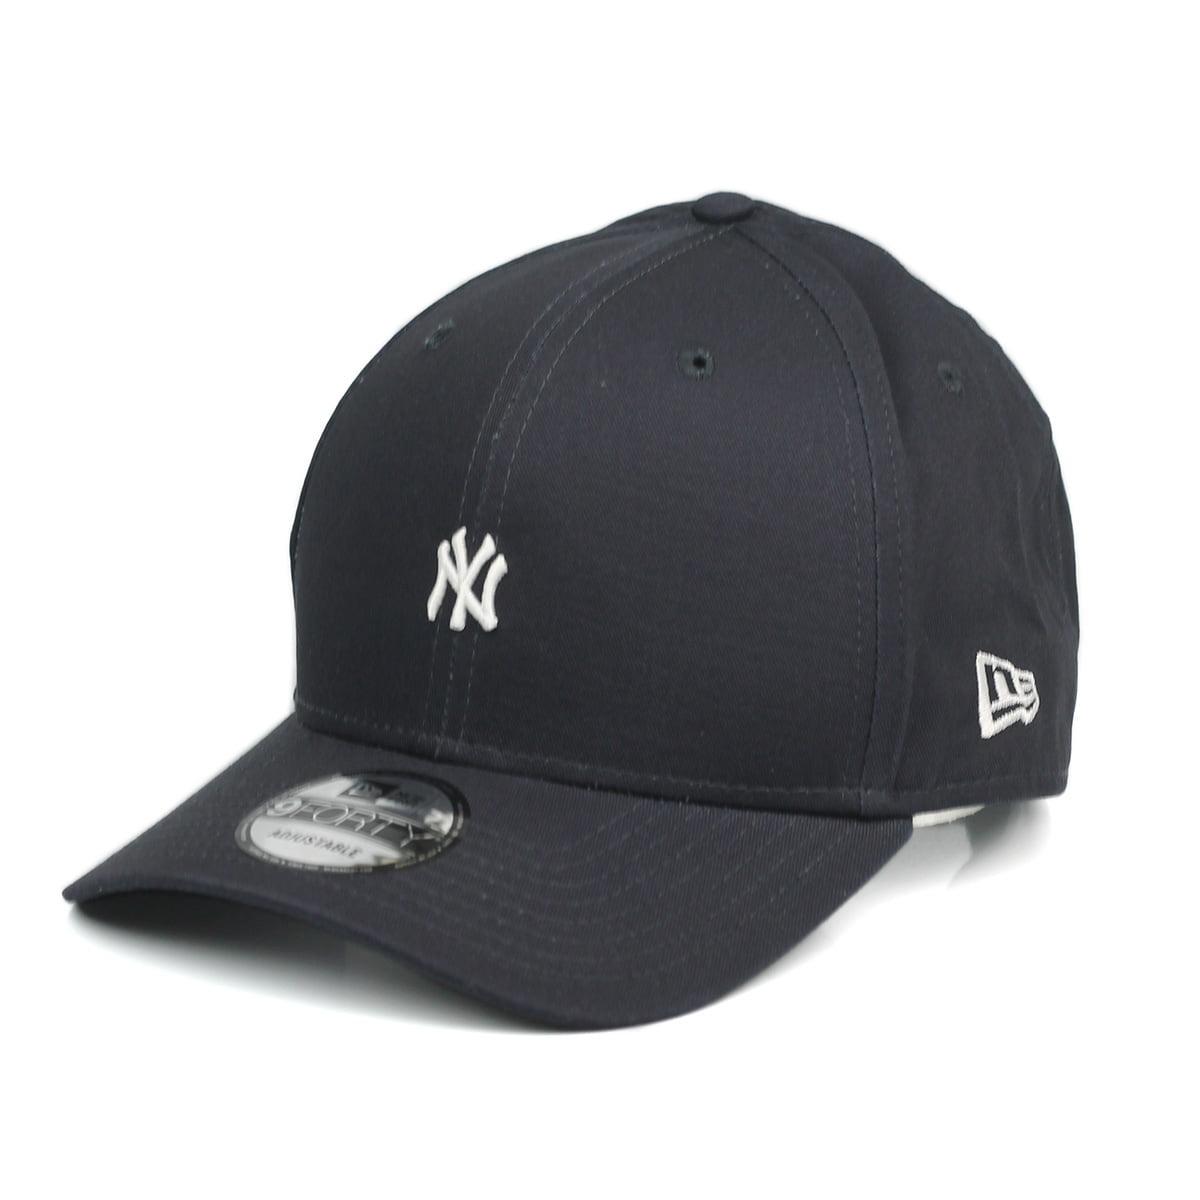 Bone New York Yankees New Era 9forty mini logo navy